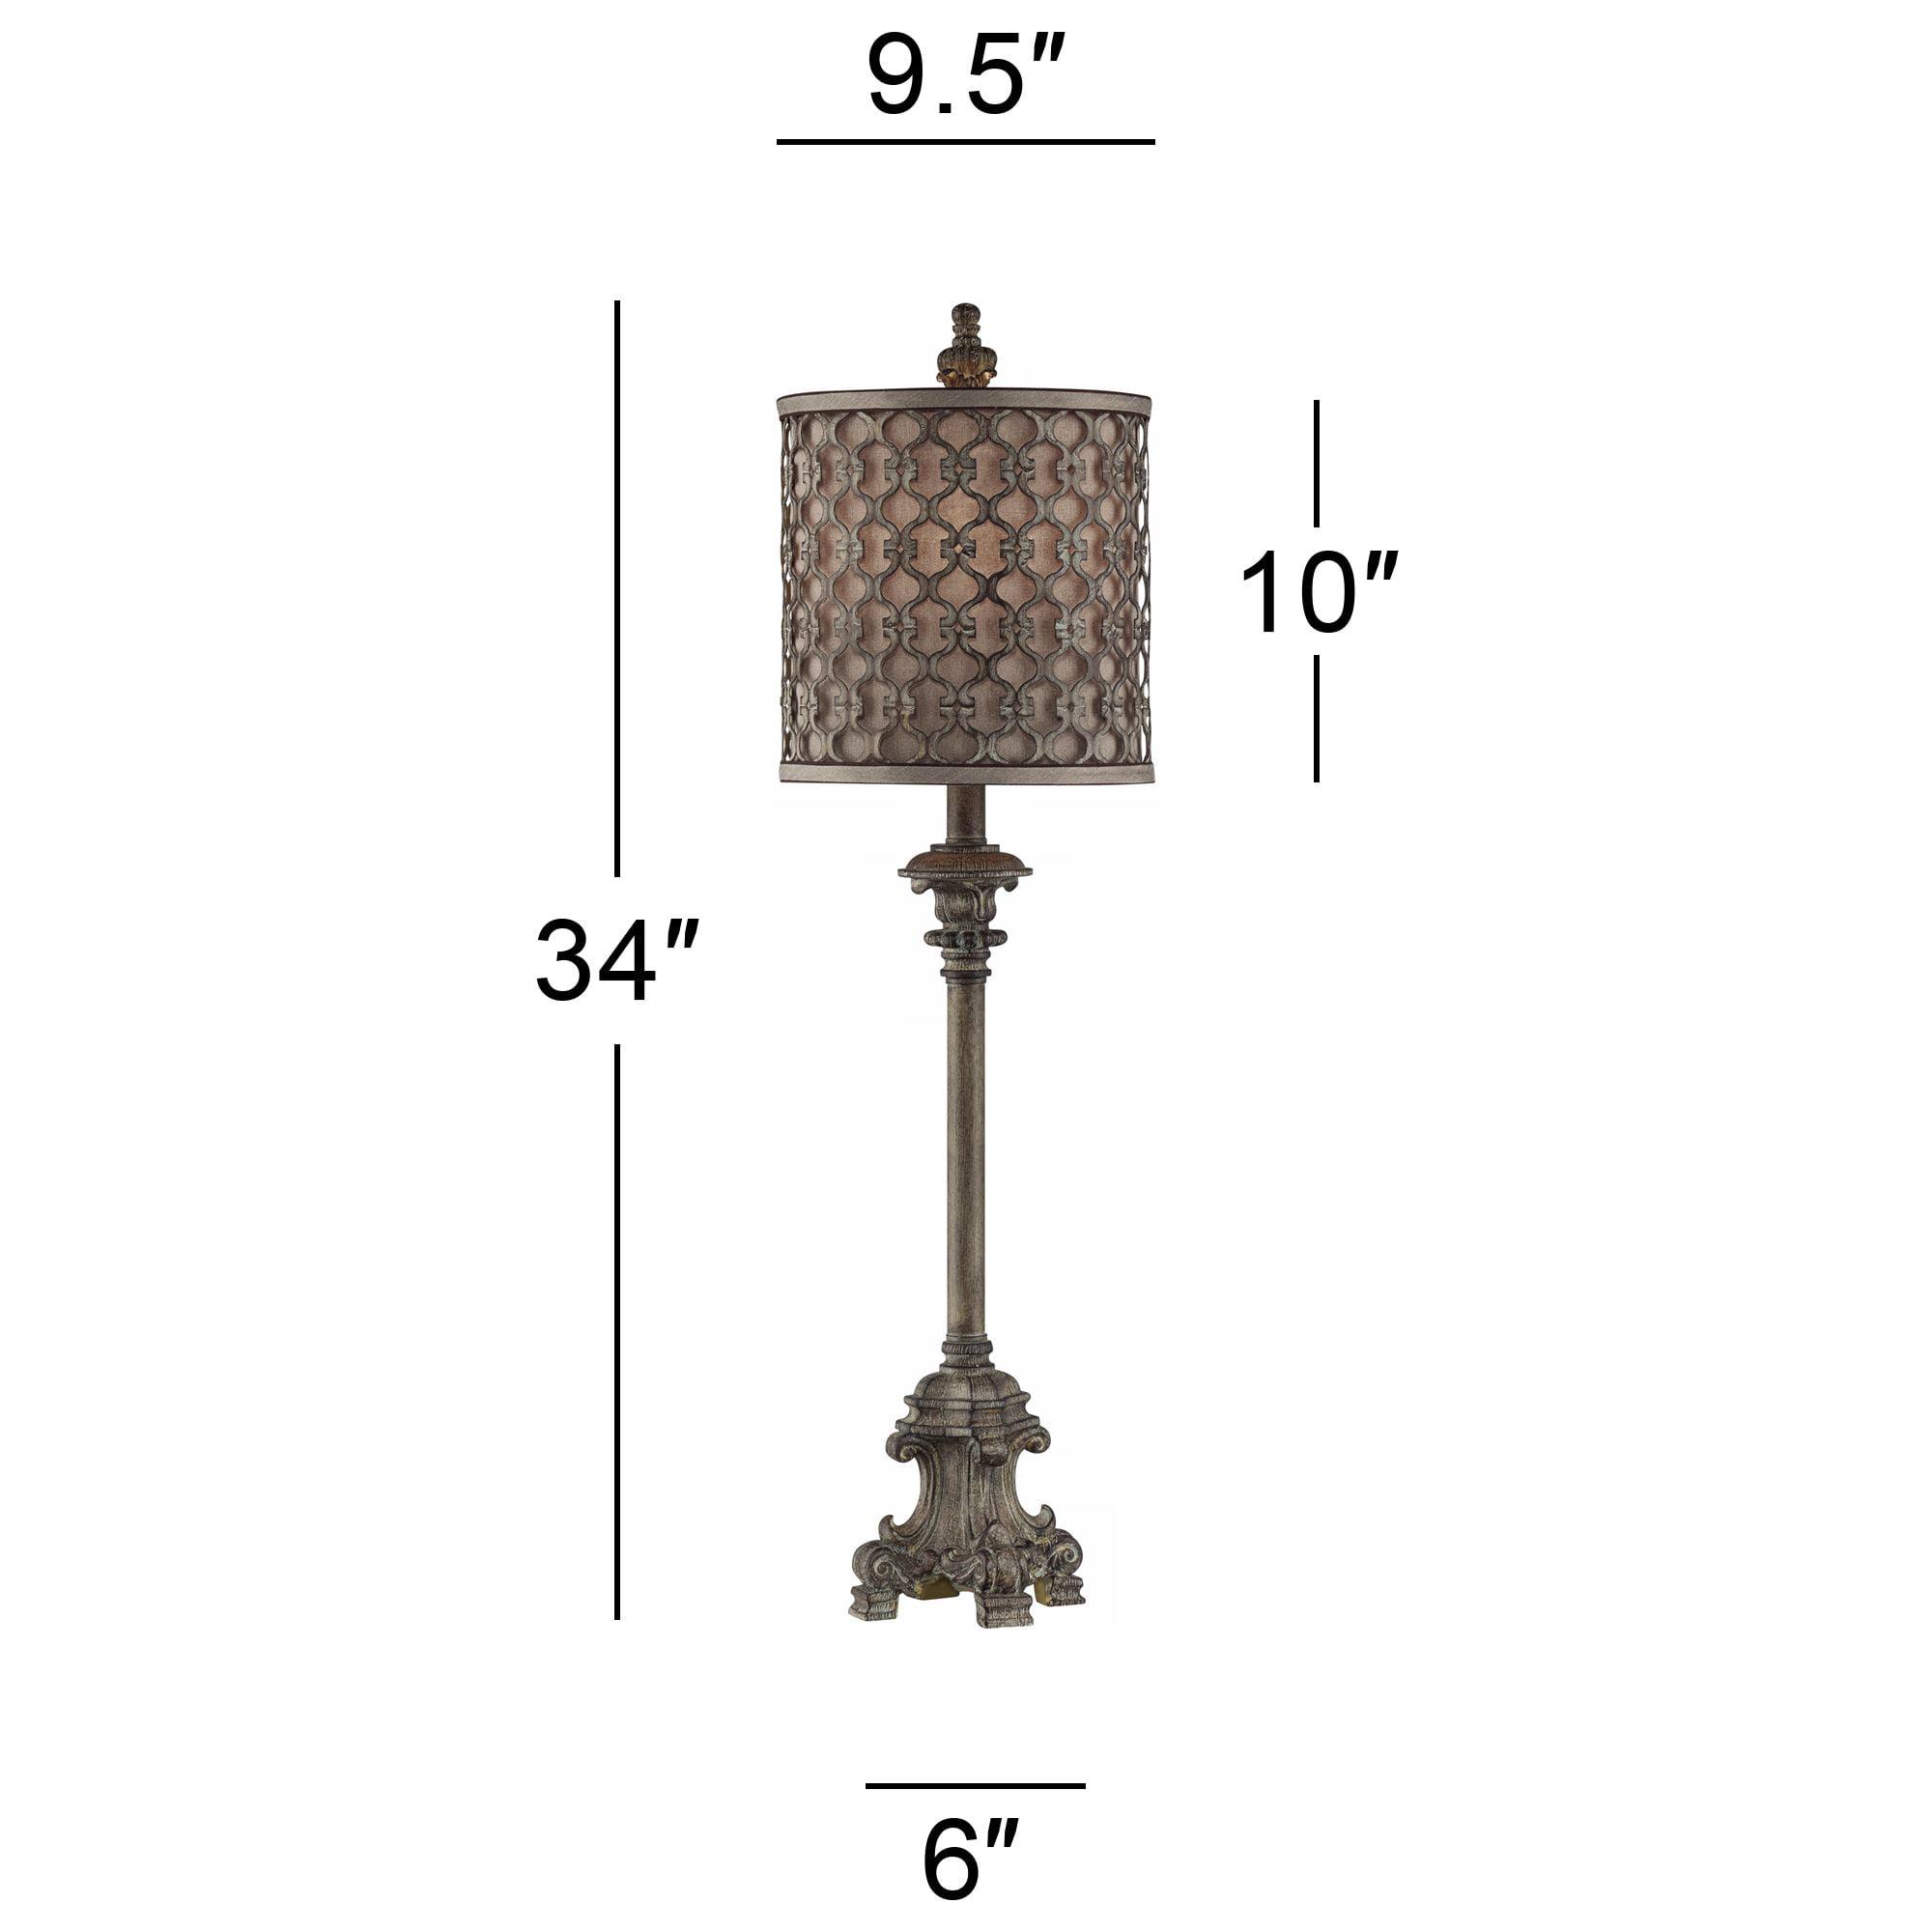 Regency Hill French Buffet Table Lamp Beige Scroll Metal Lattice Candlestick Framed Cylinder Shade For Dining Room Walmart Com Walmart Com